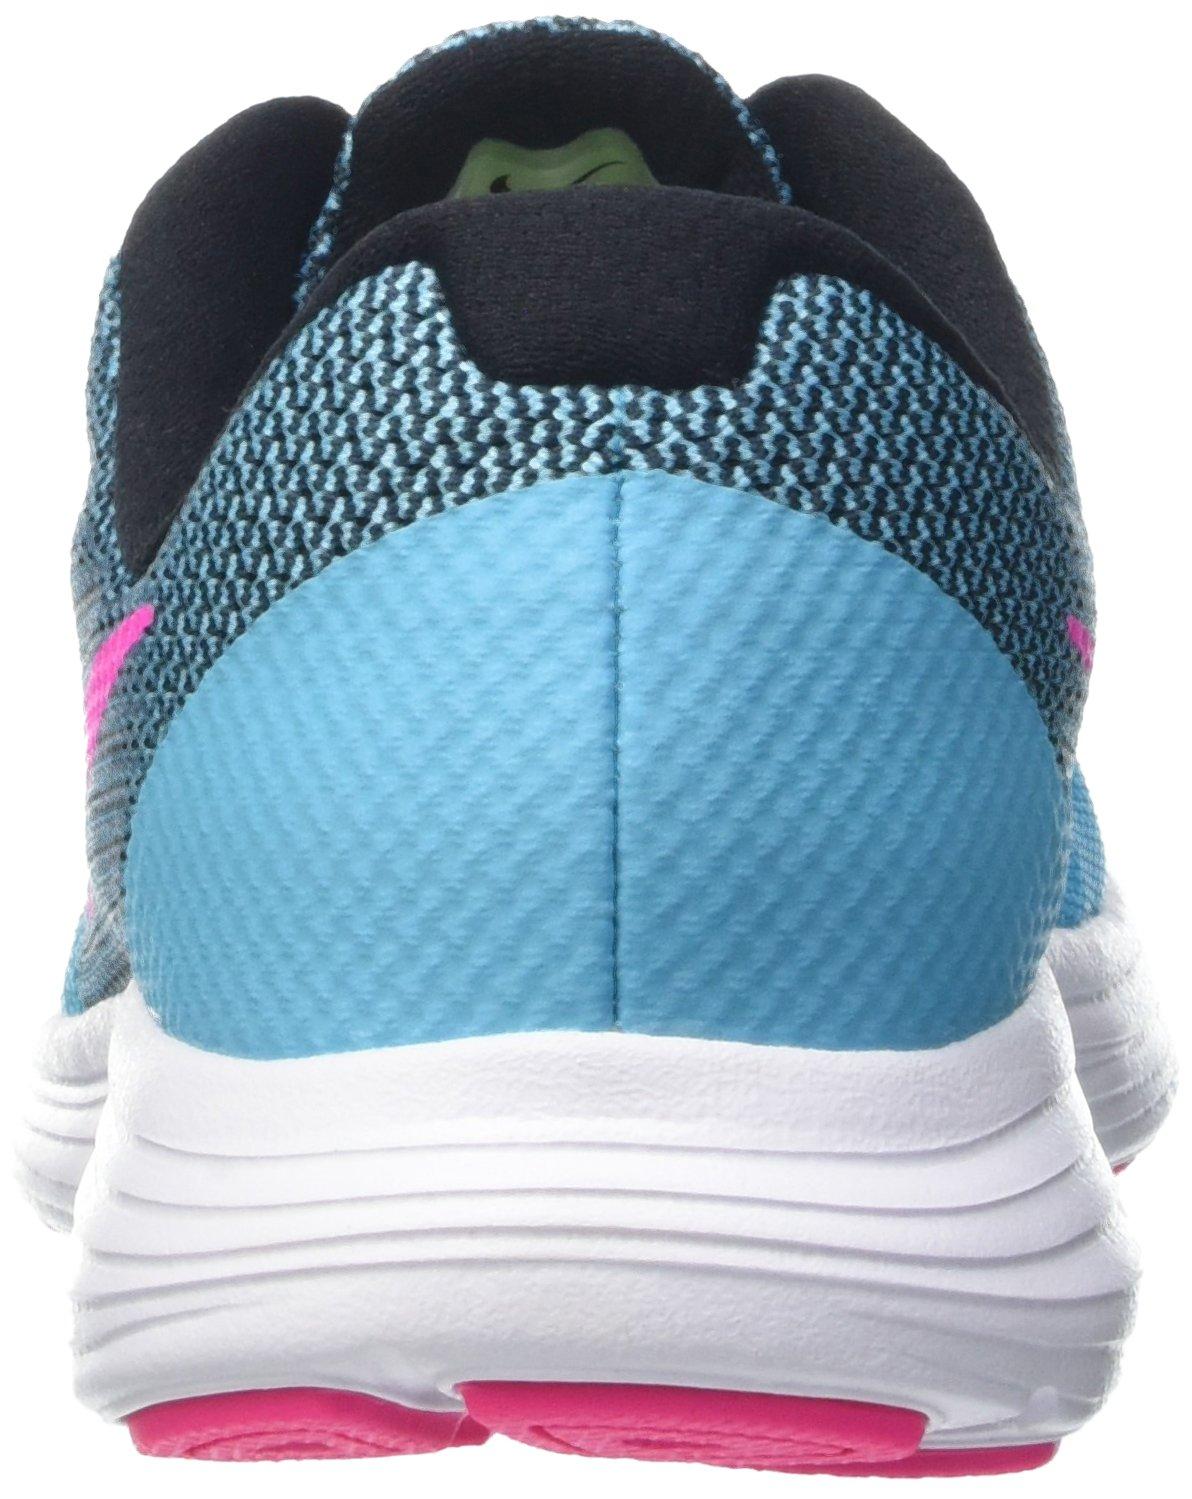 NIKE Running ' Revolution 3 (GS) Running NIKE Shoes B014TMQW7O 6 M US Big Kid|Gamma Blue/Pink Blast/Black/White 74a8c6